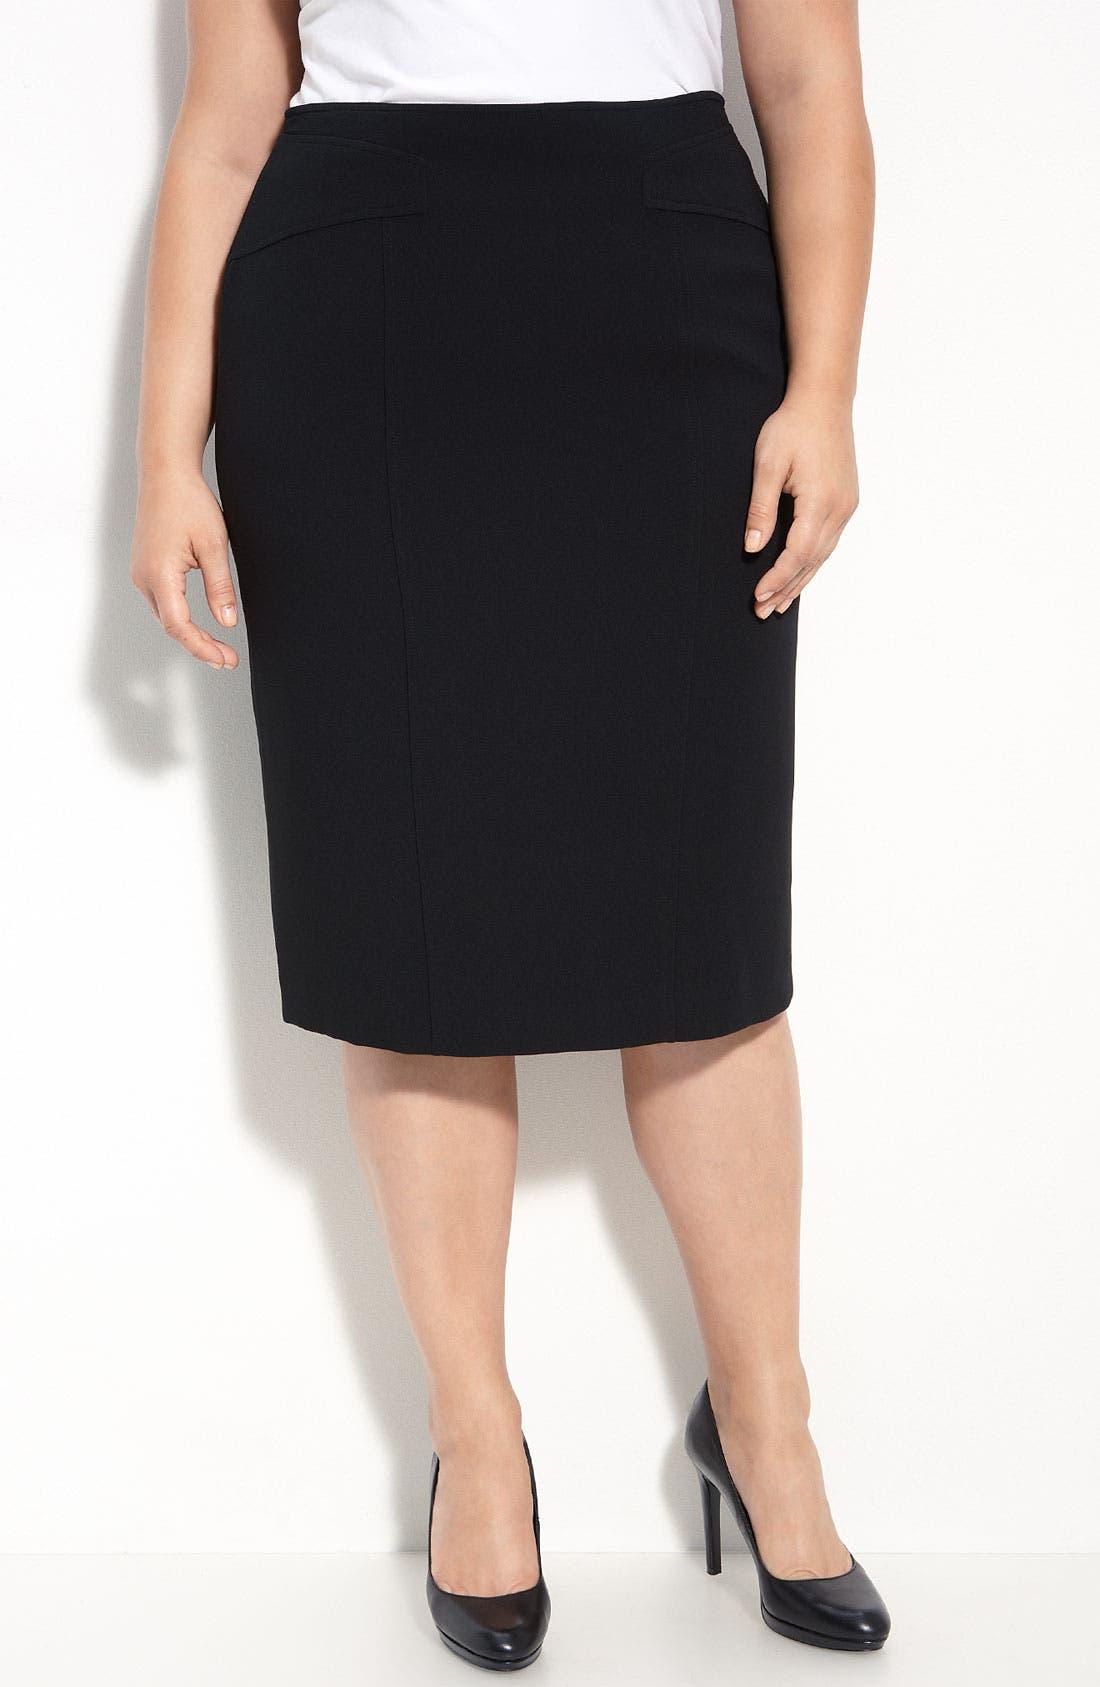 Alternate Image 1 Selected - Louben Pencil Skirt (Plus Size)